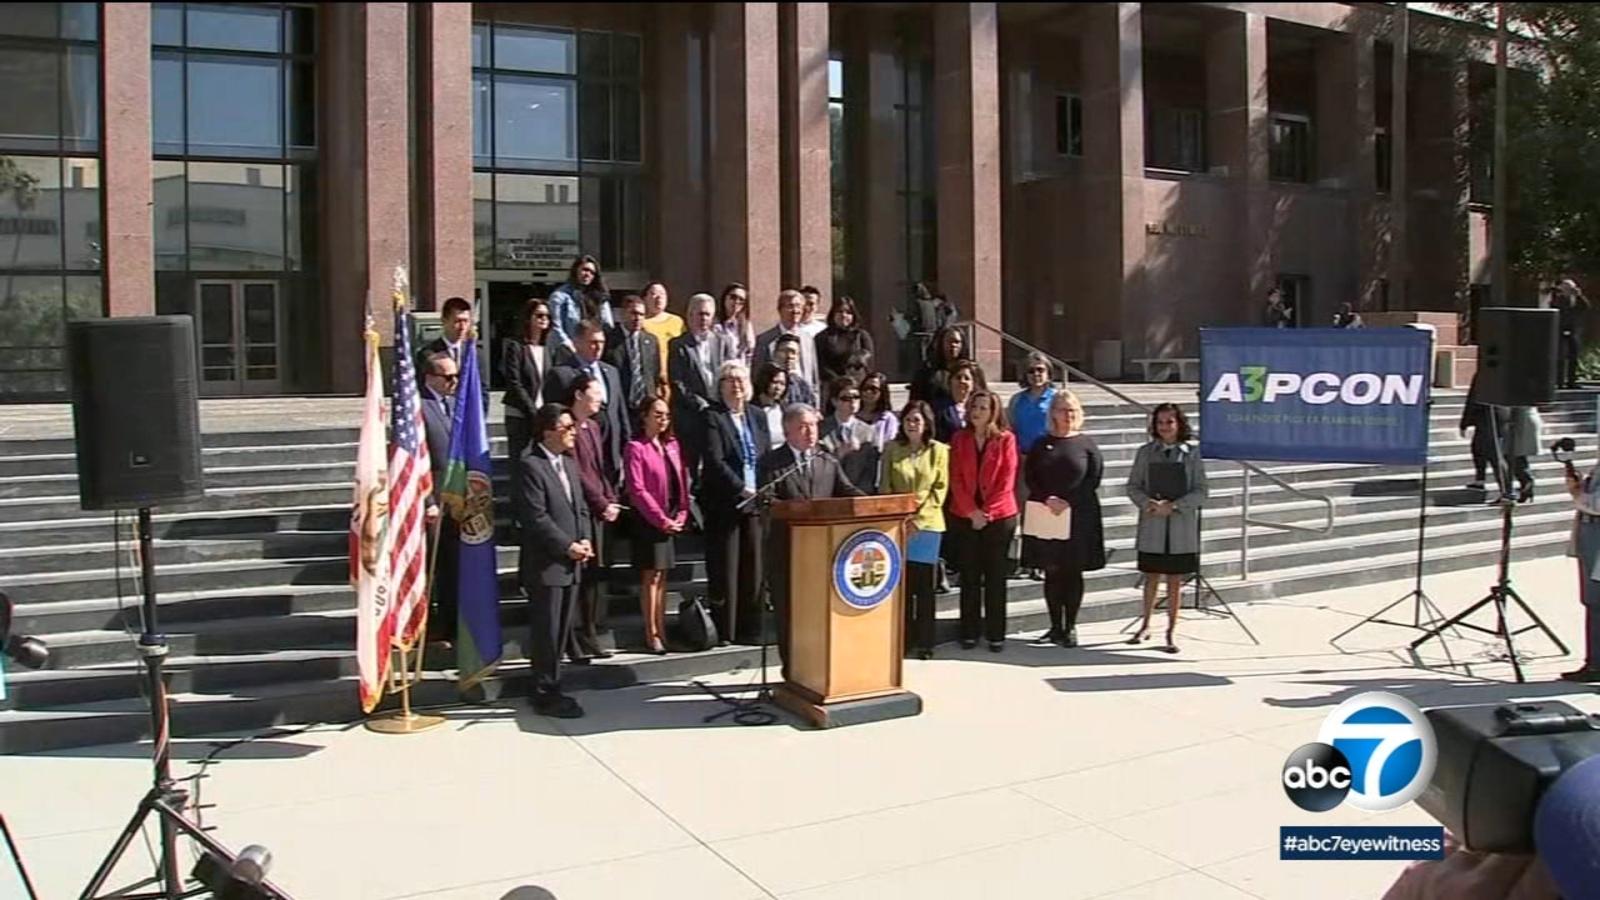 LA leaders speak out against anti-Asian racism amid coronavirus fears